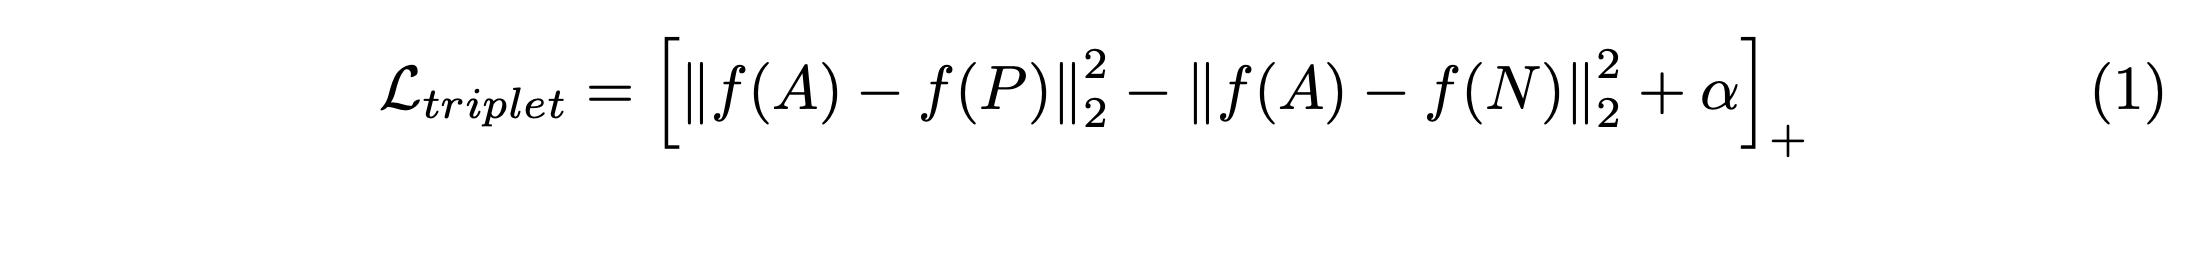 Triplet loss function